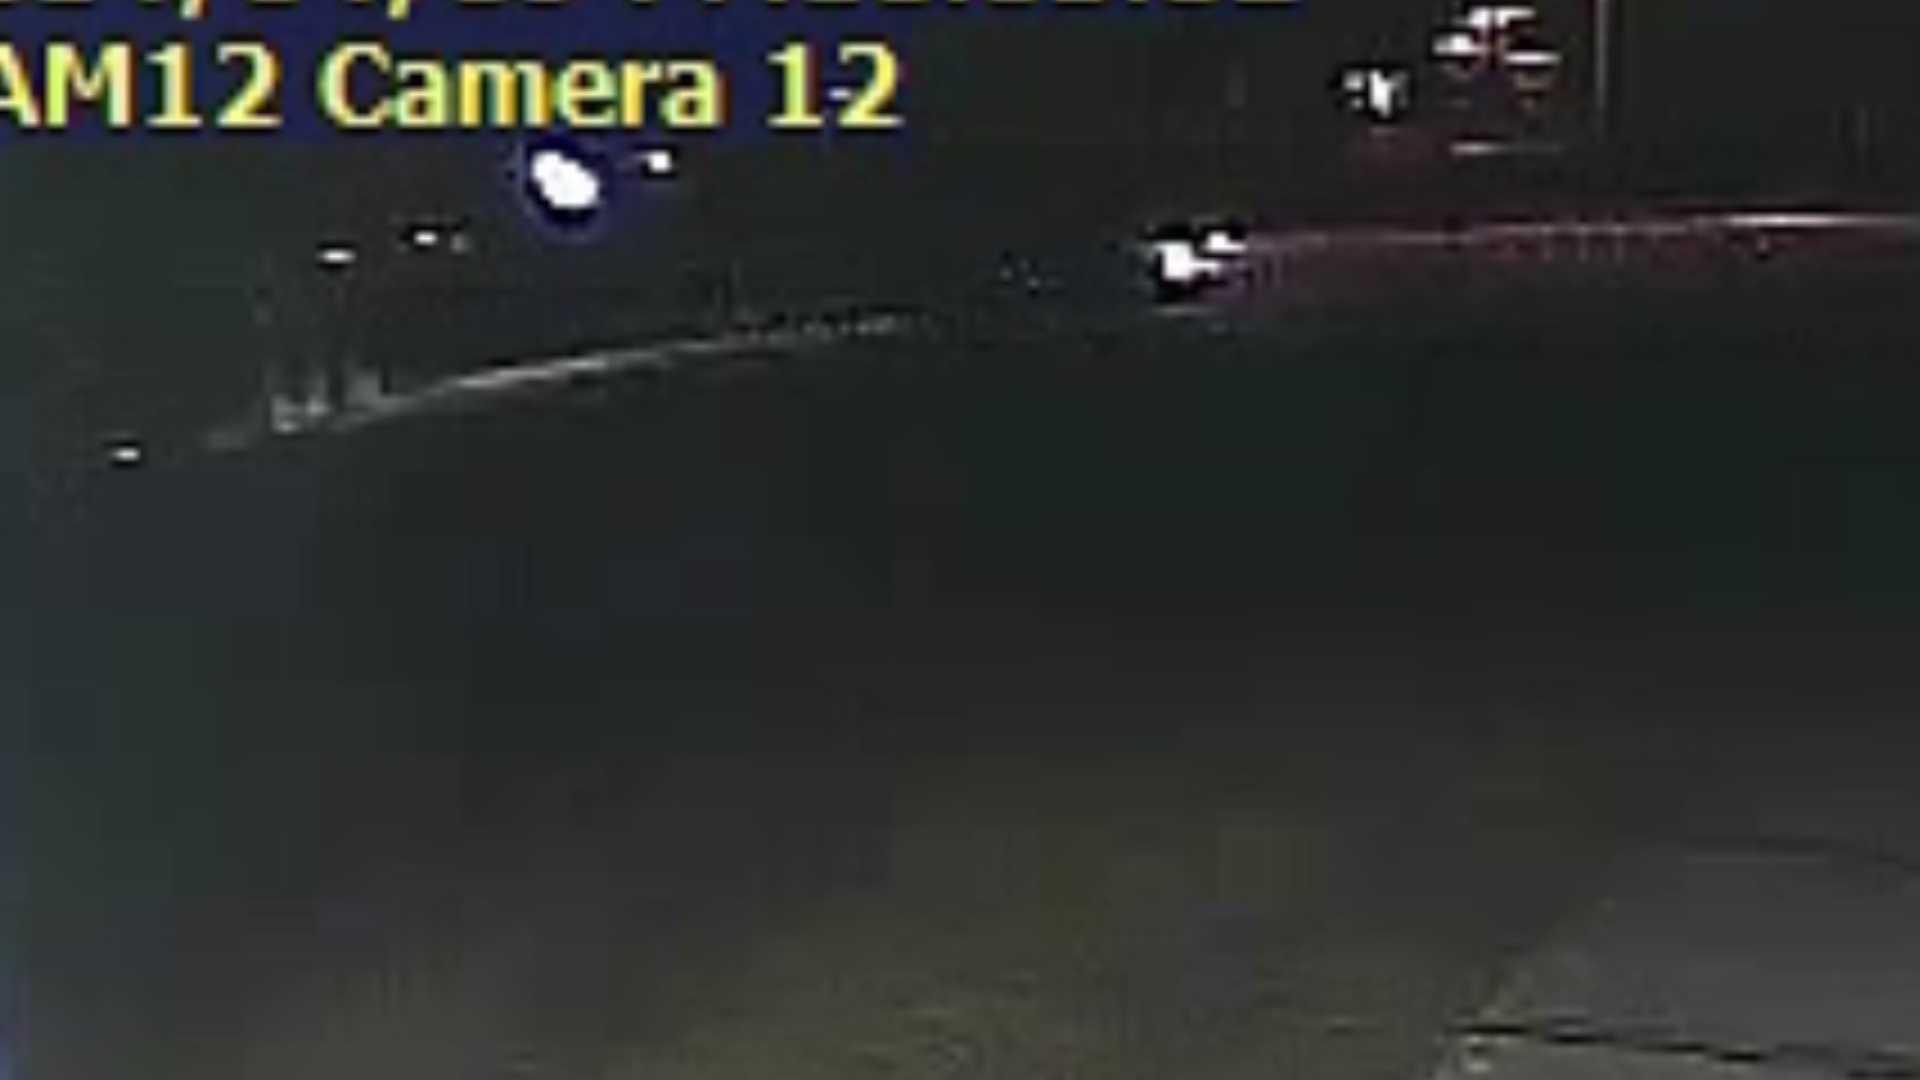 RAW VIDEO: Truck slams into fence, hydrant